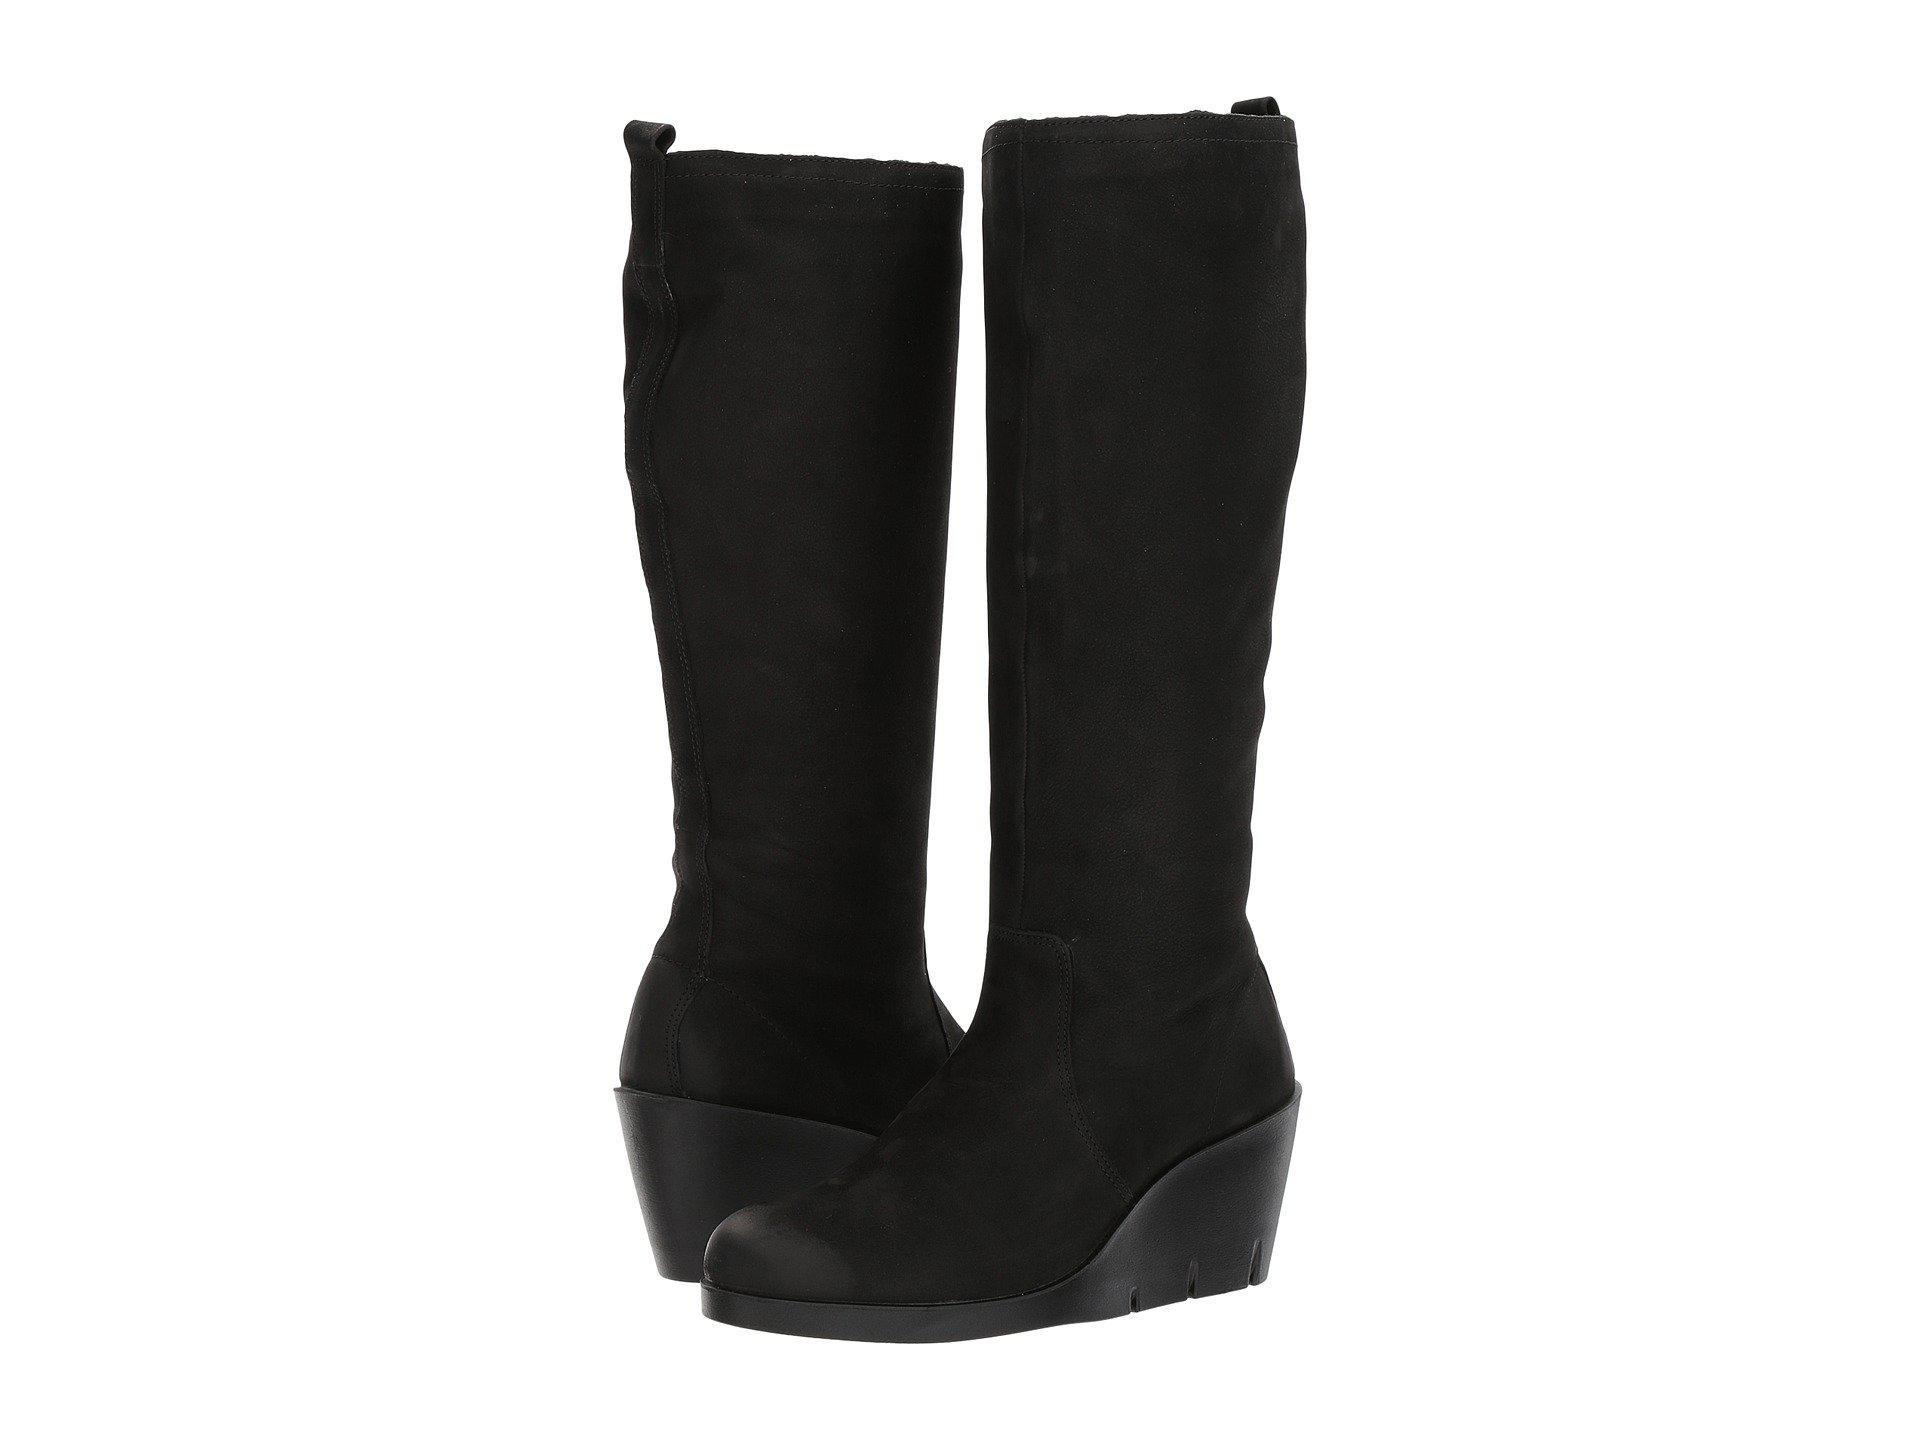 e0ac42c6dbac Lyst - Ecco Bella Wedge Tall Boot in Black